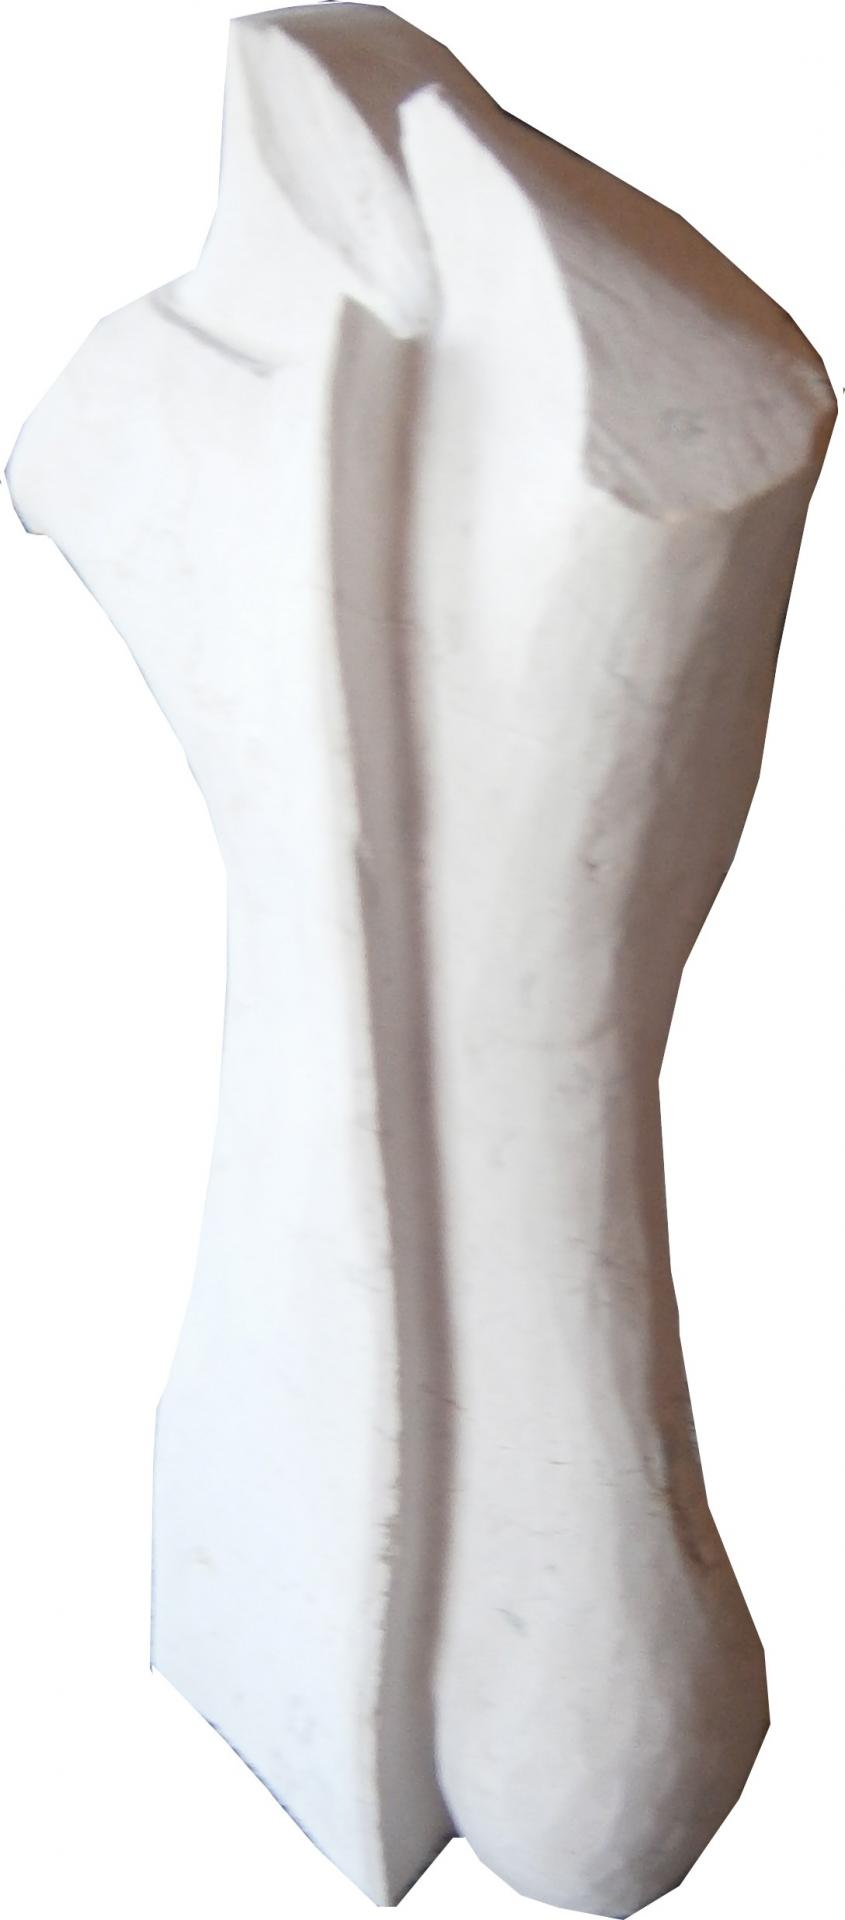 P6271535